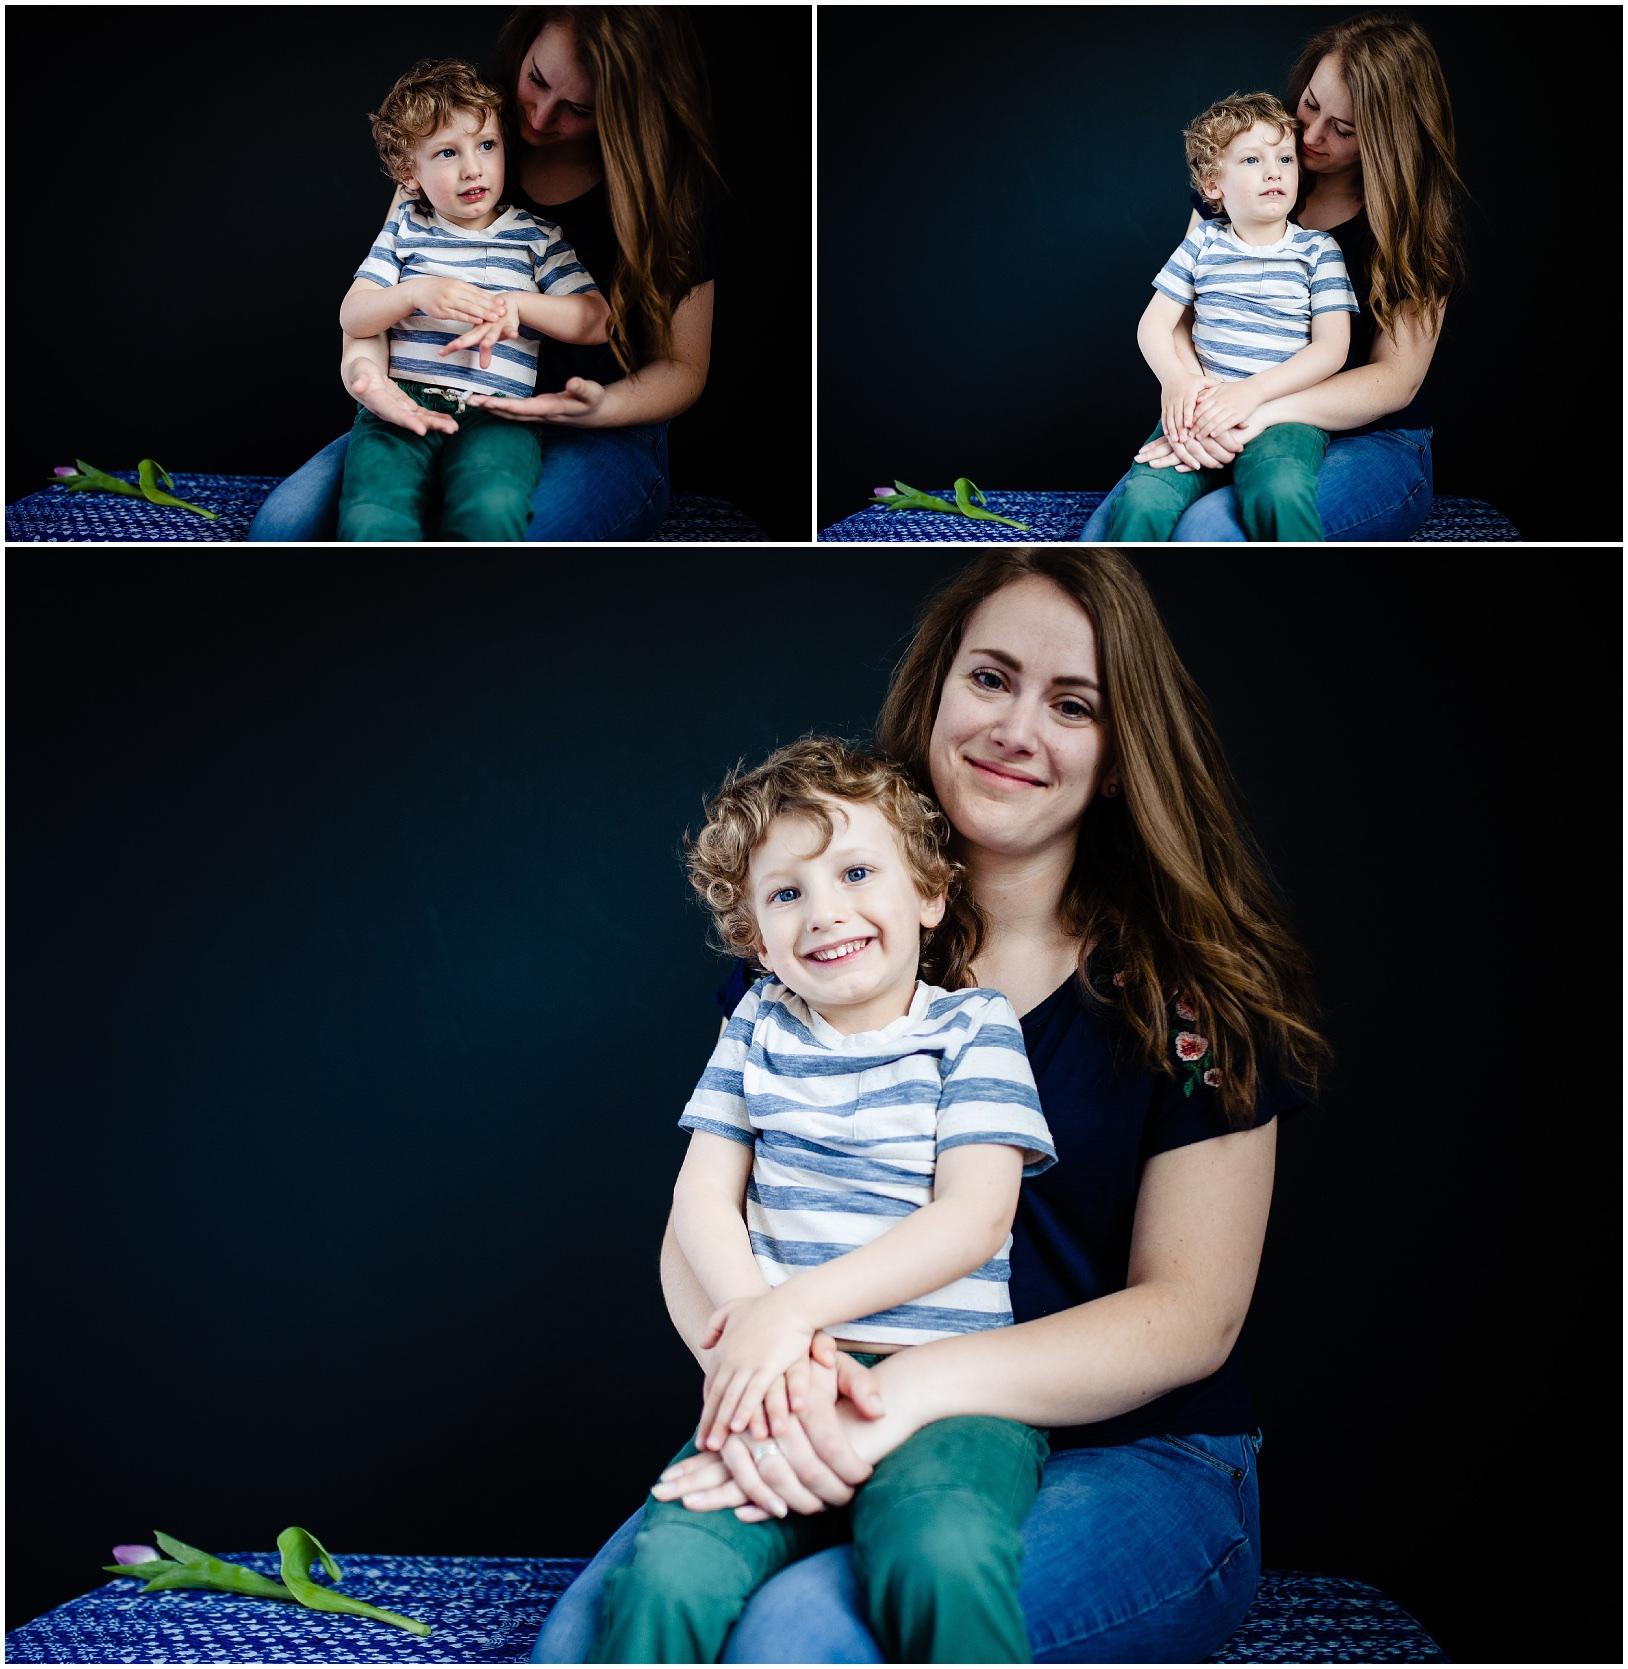 lindseyjanephotography_portraits006.jpg